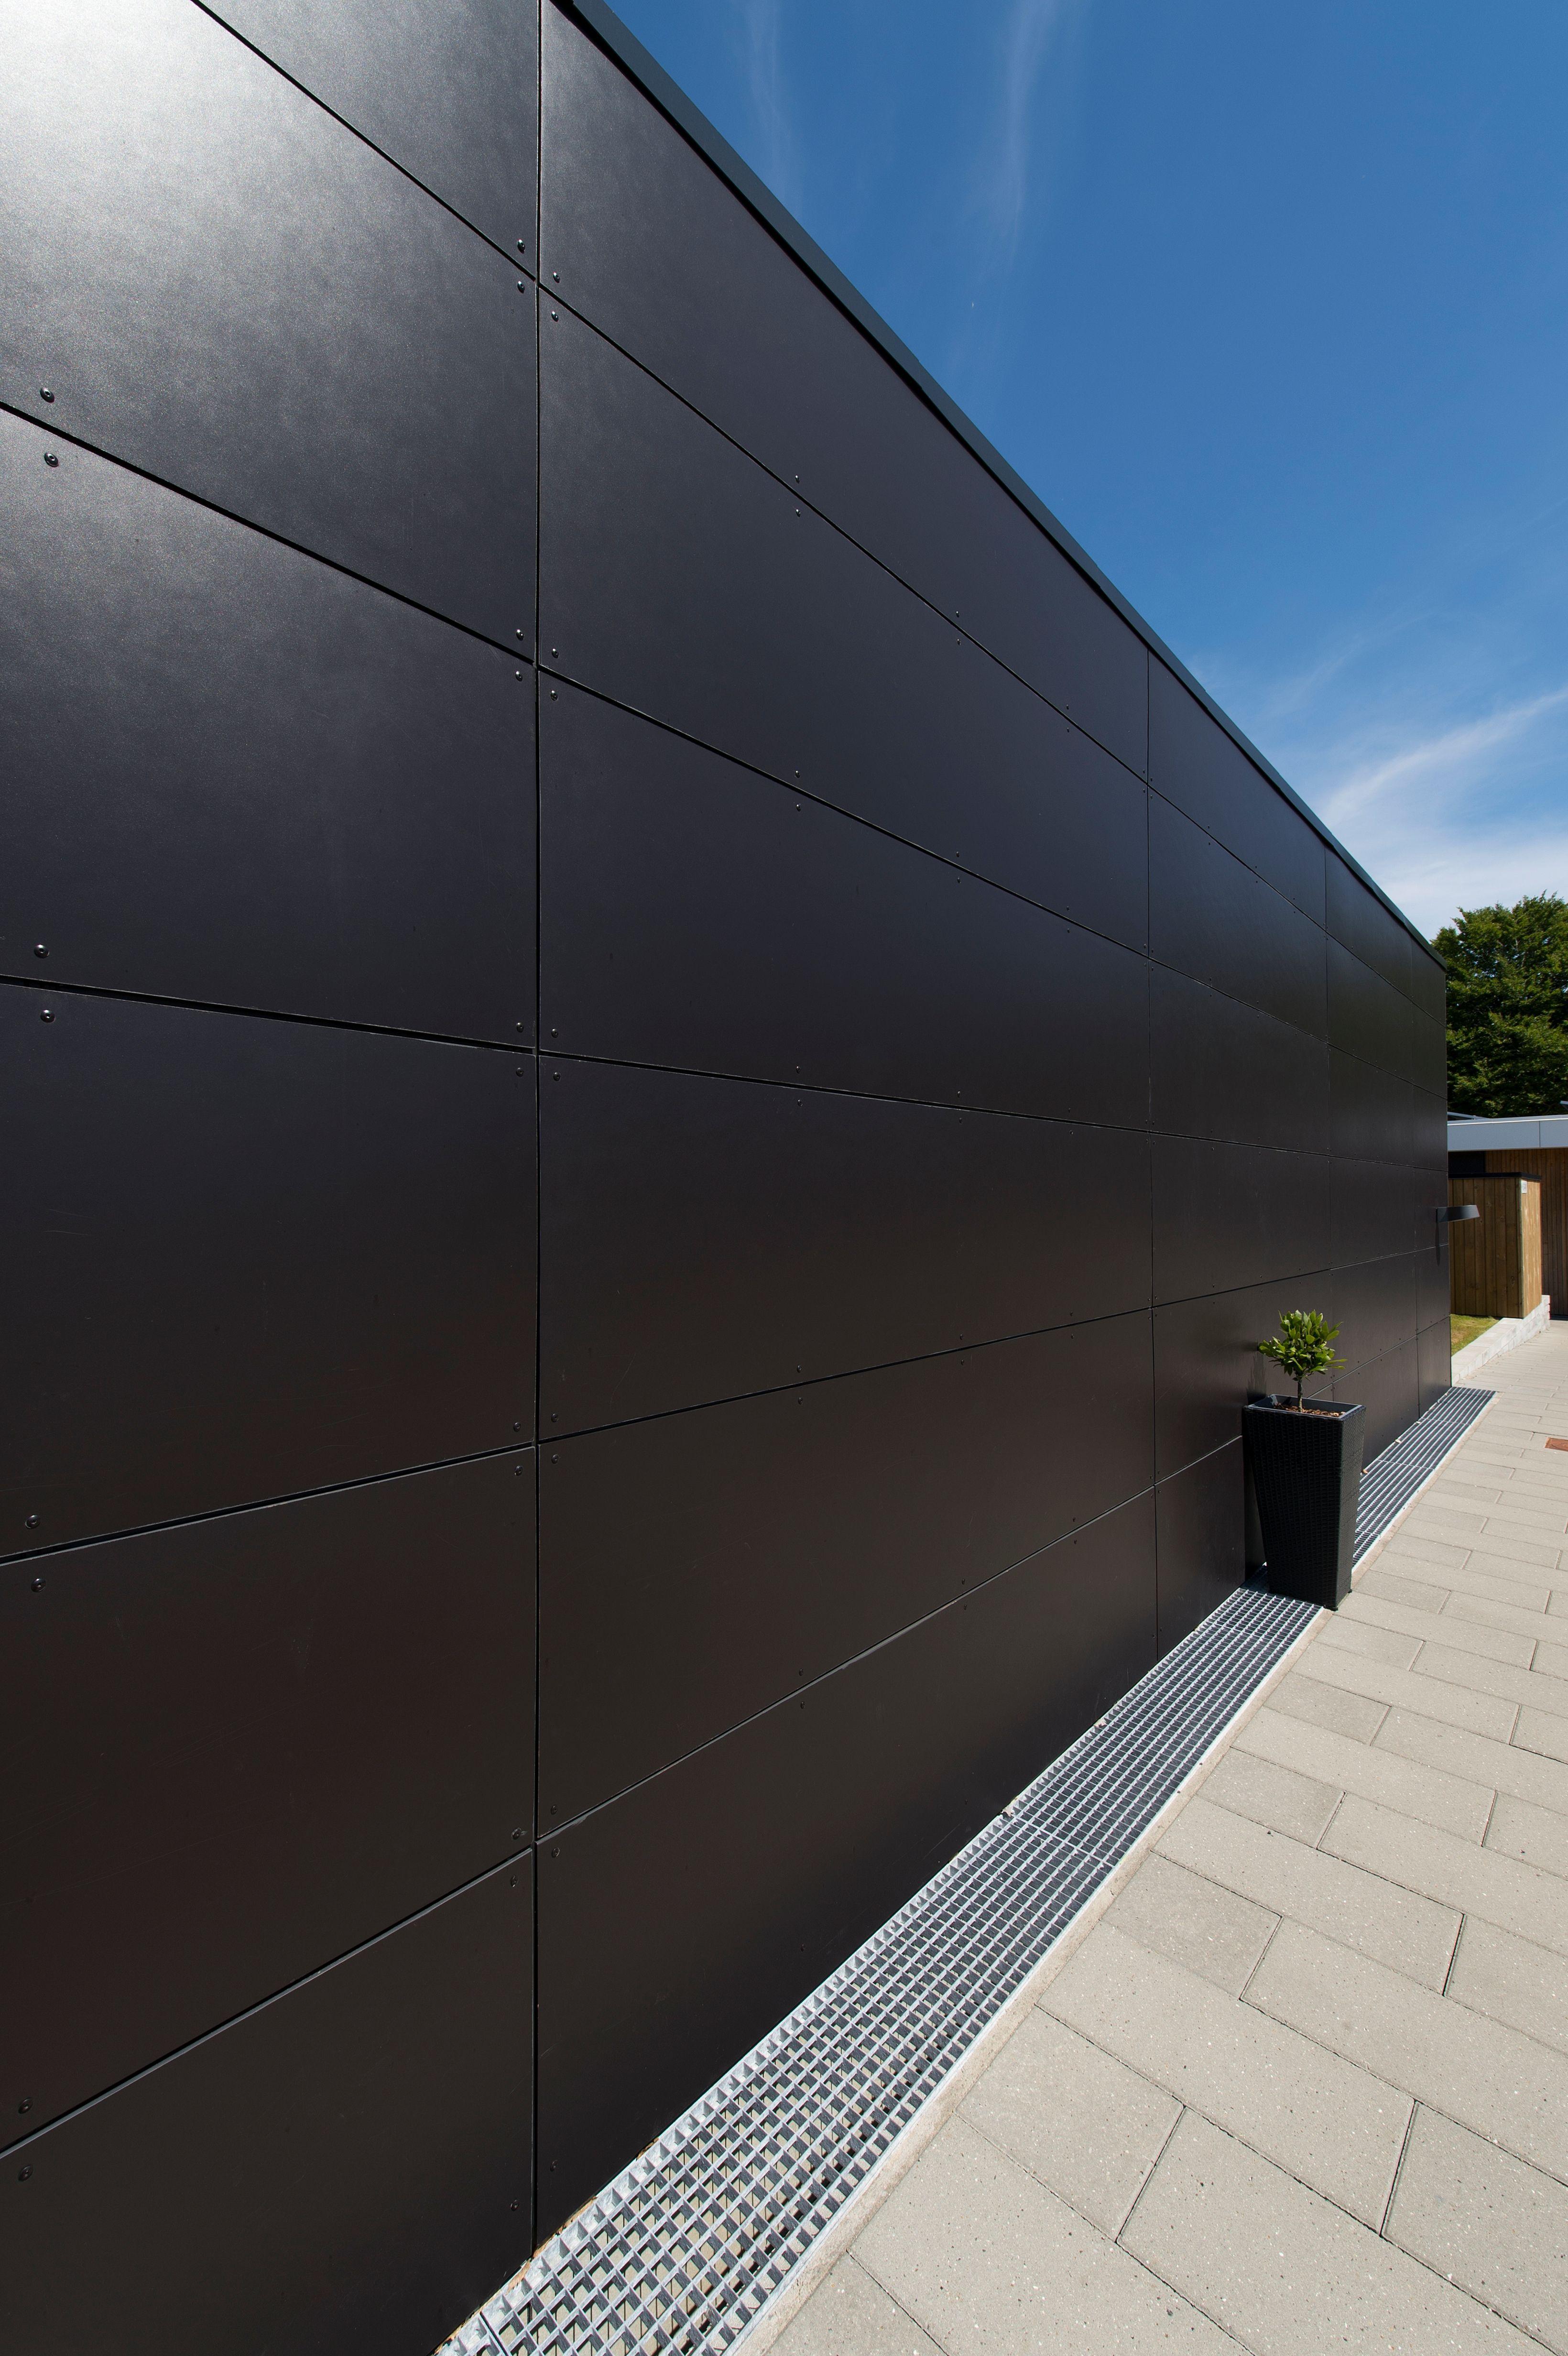 Pin By Anne Ellen Geiger On Concrete Board Hardieboard In The Garden Facade Cladding Fiber Cement Exterior Siding